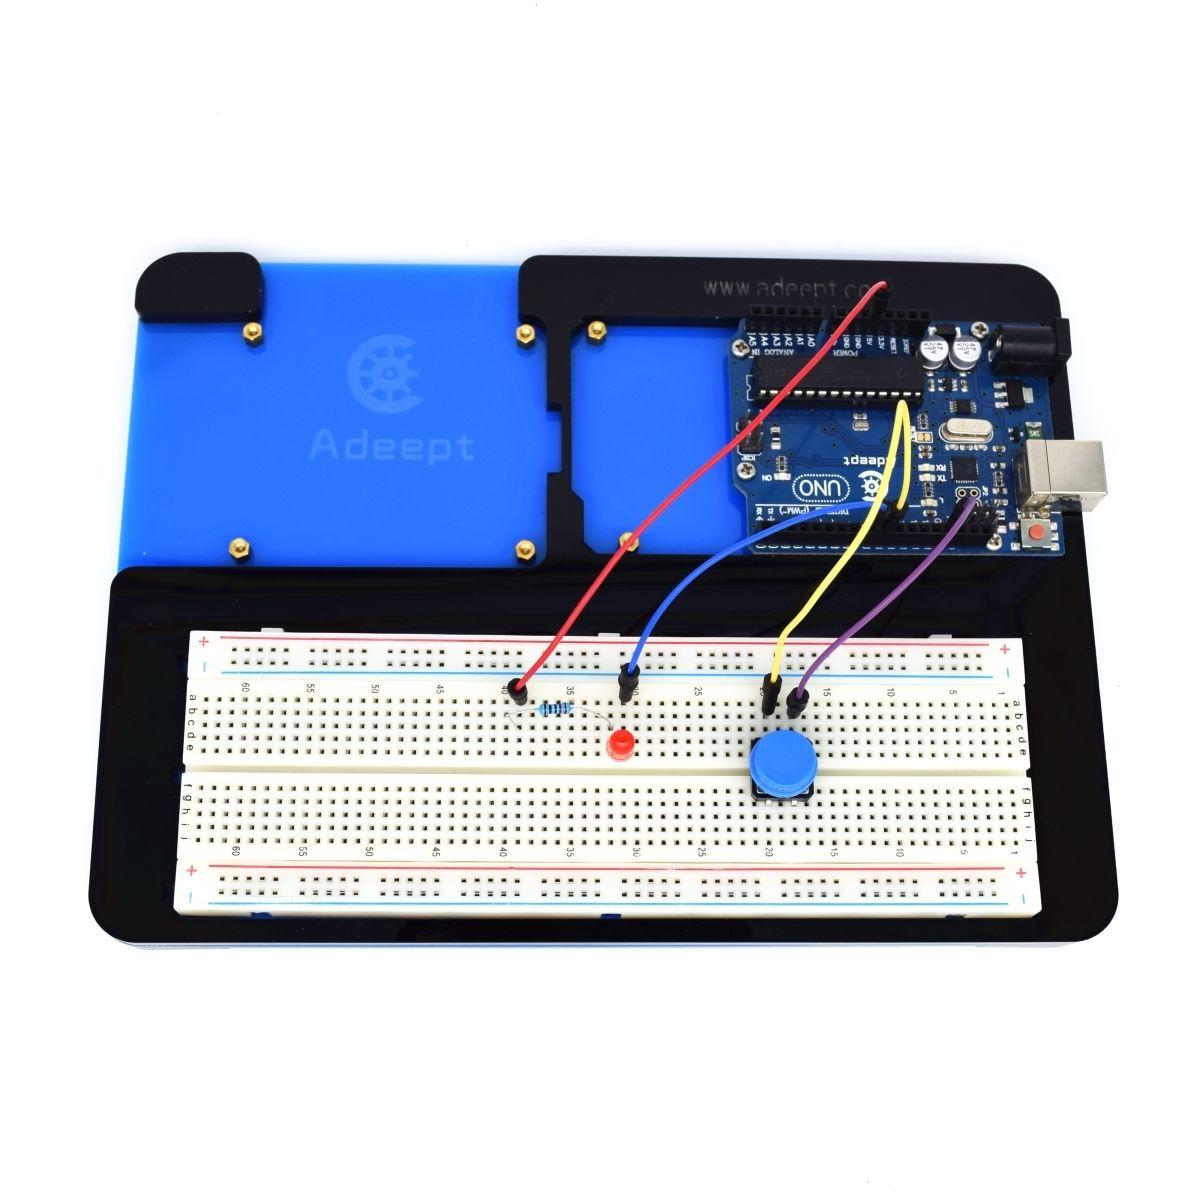 Adeept acrylic in breadboard holder for arduino uno r